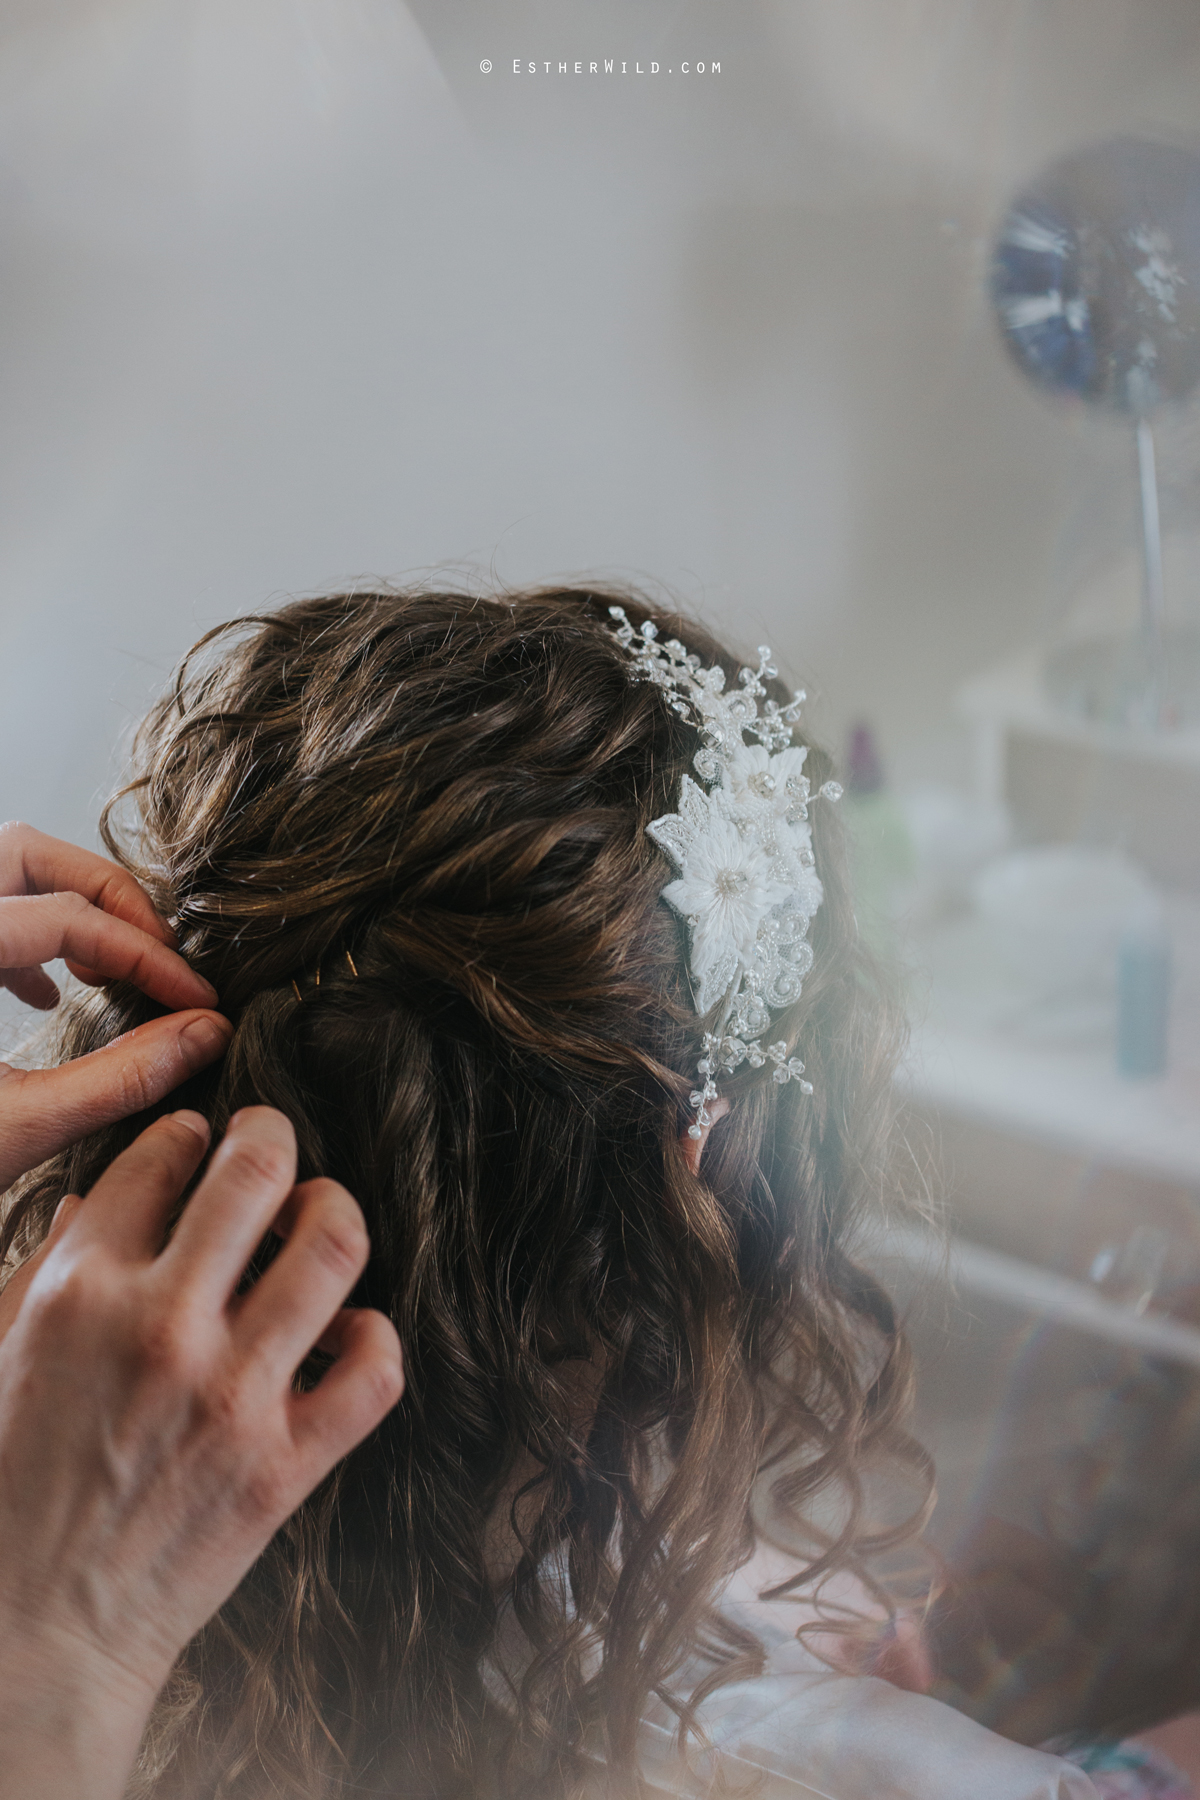 The_BoatHouse_Wedding_Venue_Ormesby_Norfolk_Broads_Boat_Wedding_Photography_Esther_Wild_Photographer_IMG_0209.jpg